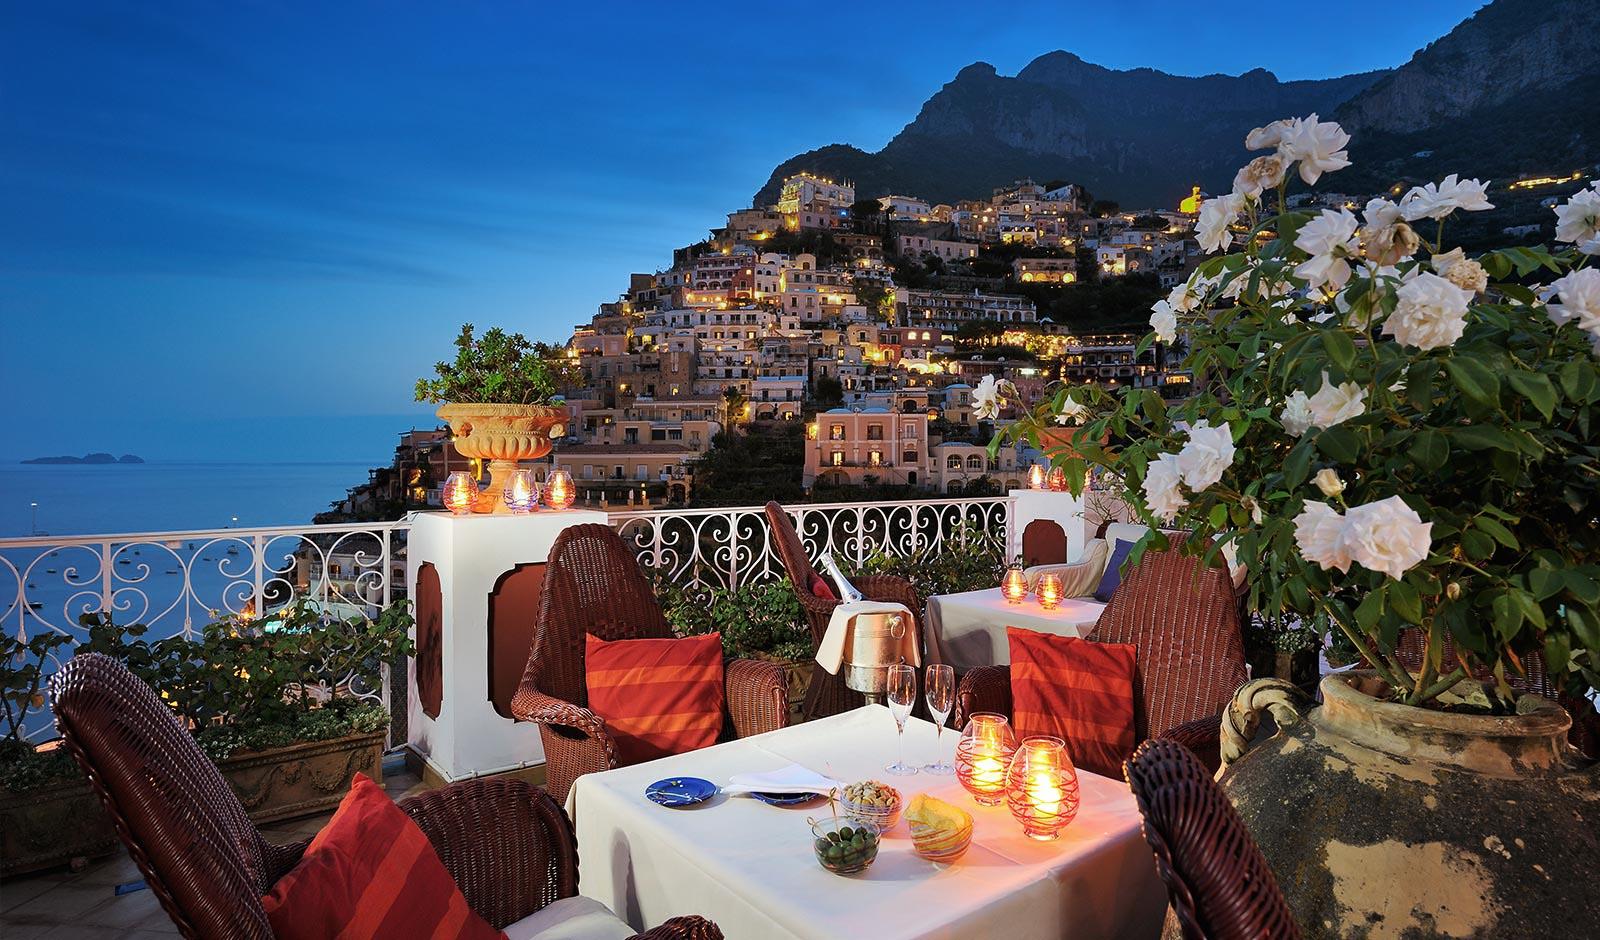 Le Sirenuse's Champagne Bar is a great Amalfi Coast restaurant